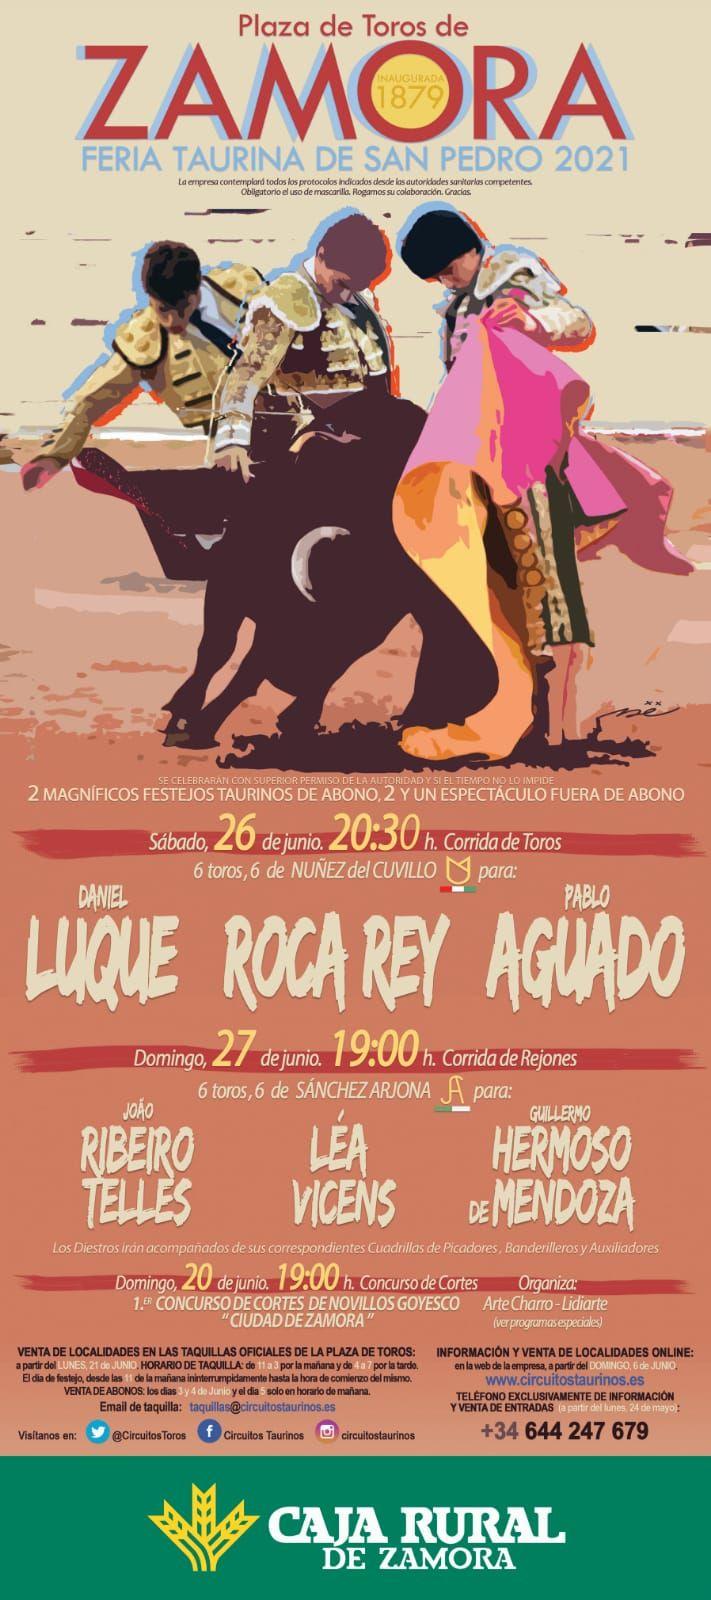 Cartel de la feria taurina de San Pedro 2021